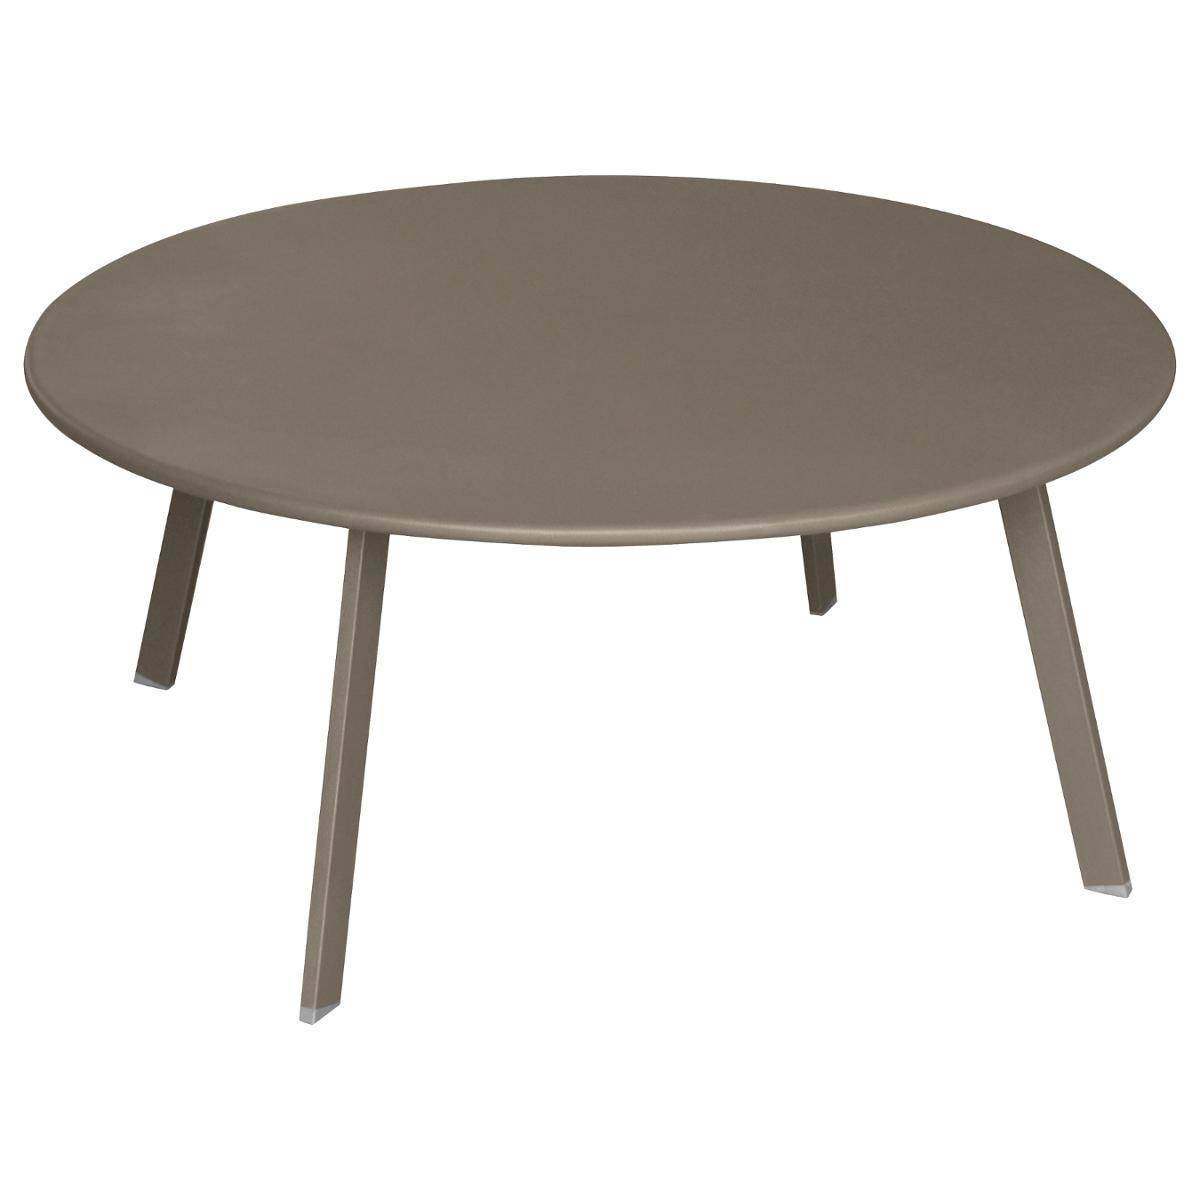 Hespéride Table d'appoint de jardin ronde Saona Tonka 90 x 40 cm - Acier traité époxy